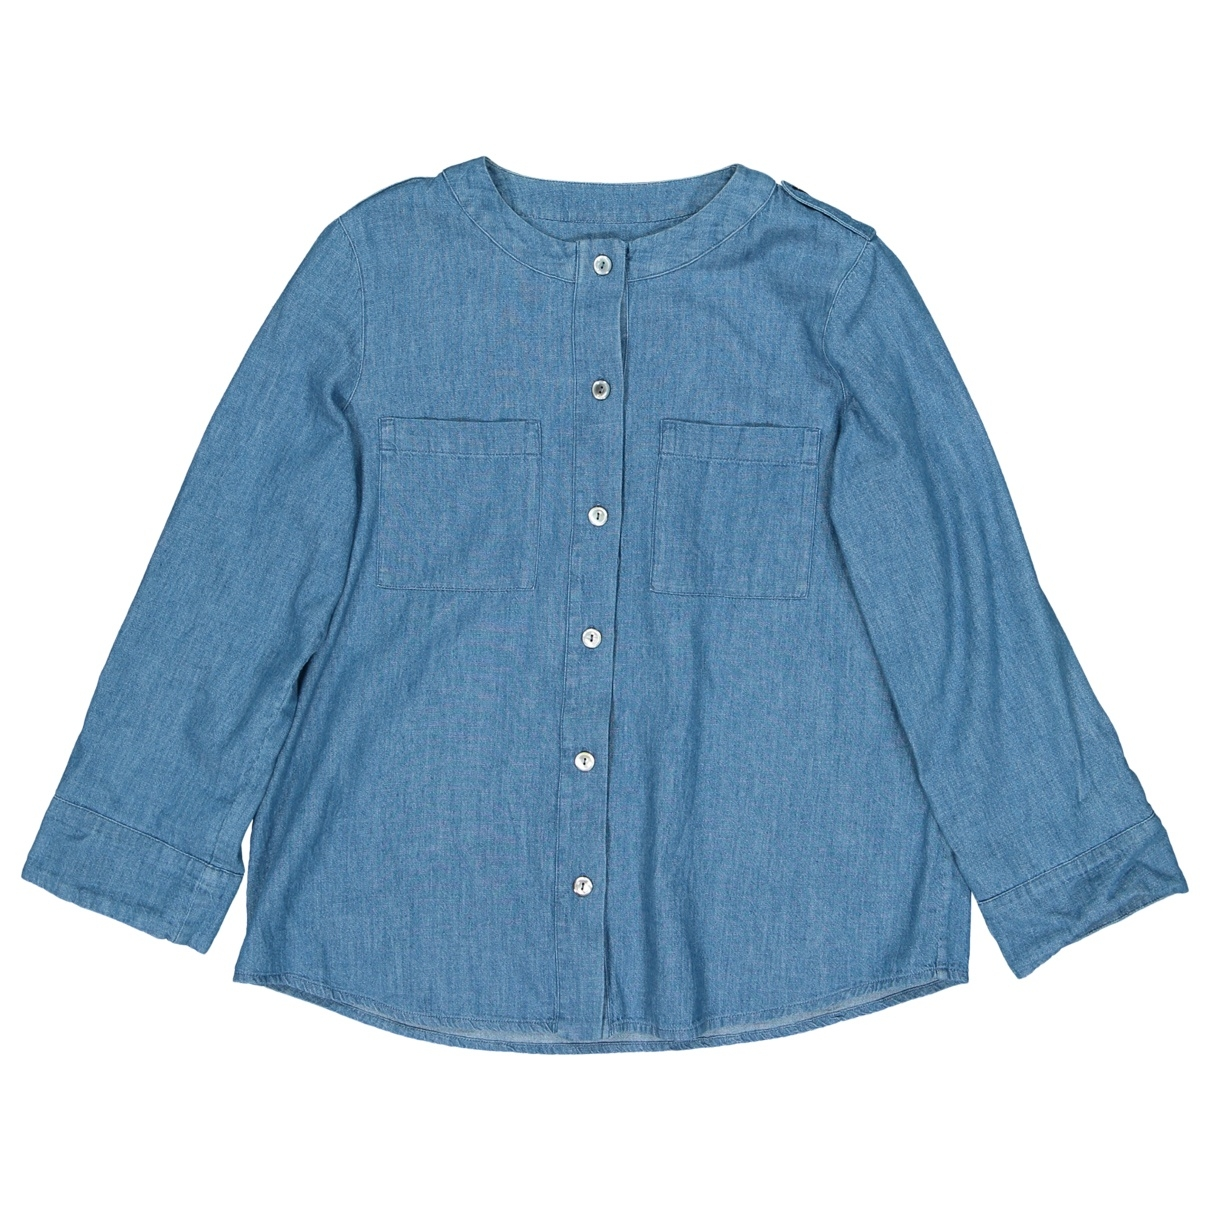 Apc - Top   pour femme en coton - bleu